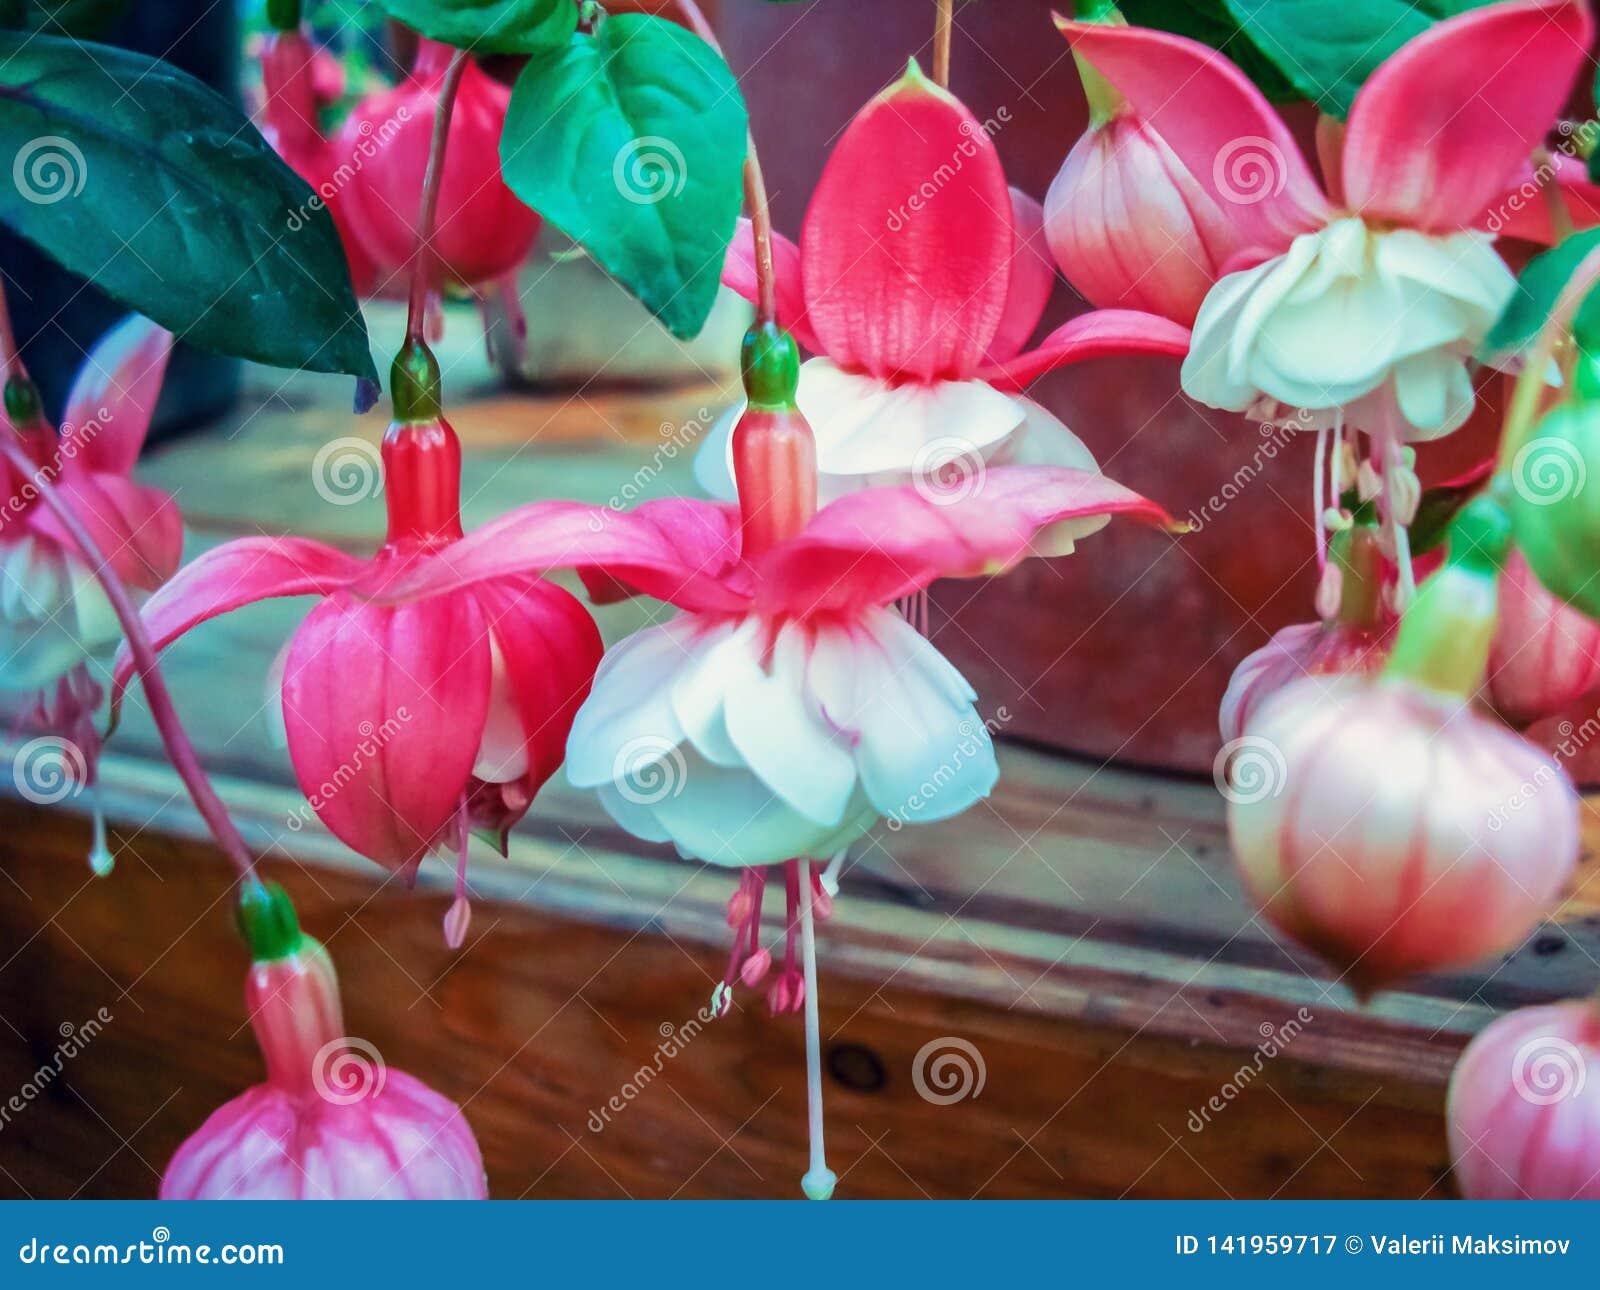 Exotic fuchsia flowers in the city botanical garden